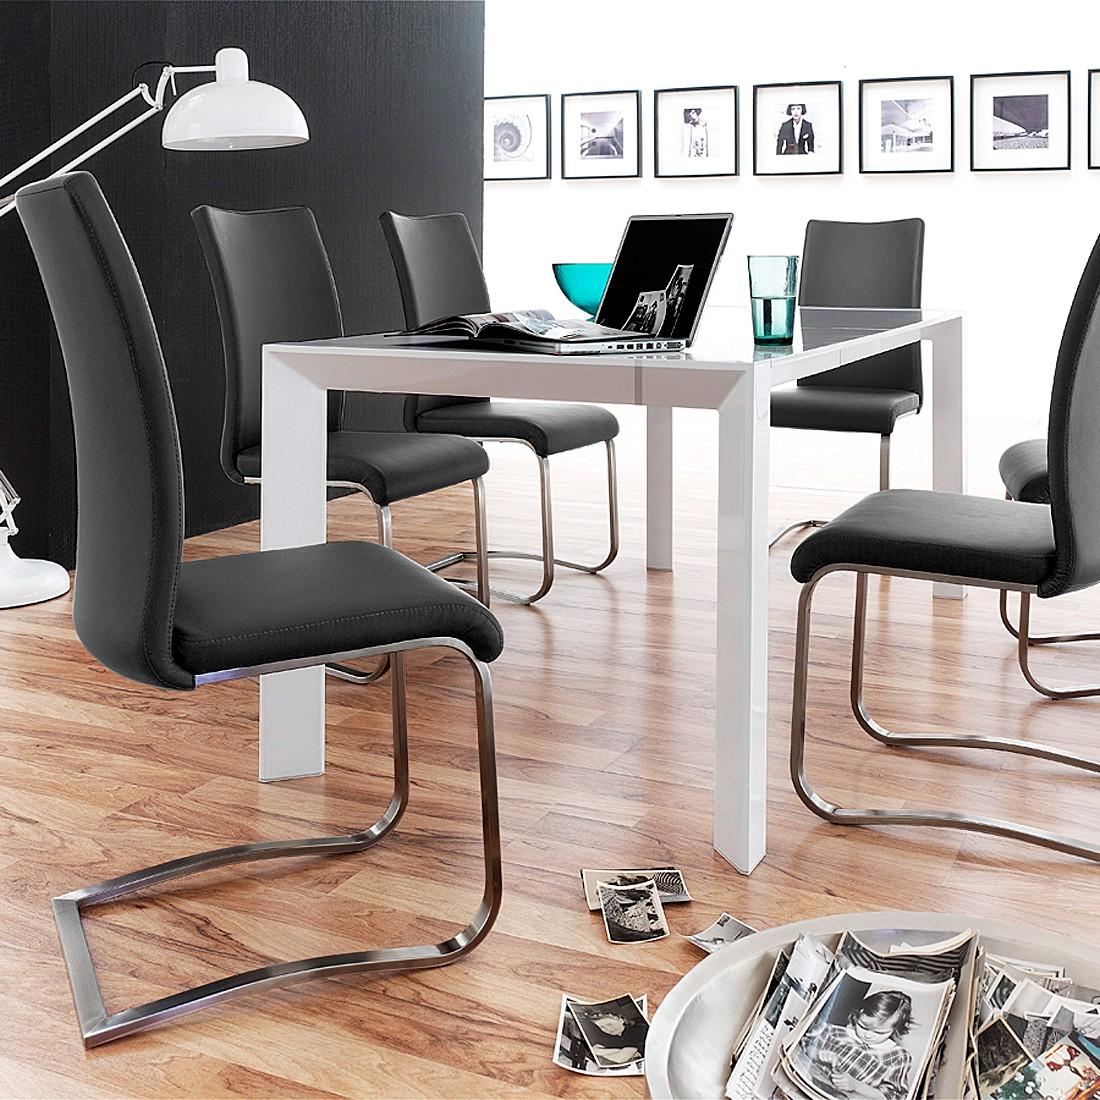 bellinzona archive seite 4 von 11. Black Bedroom Furniture Sets. Home Design Ideas